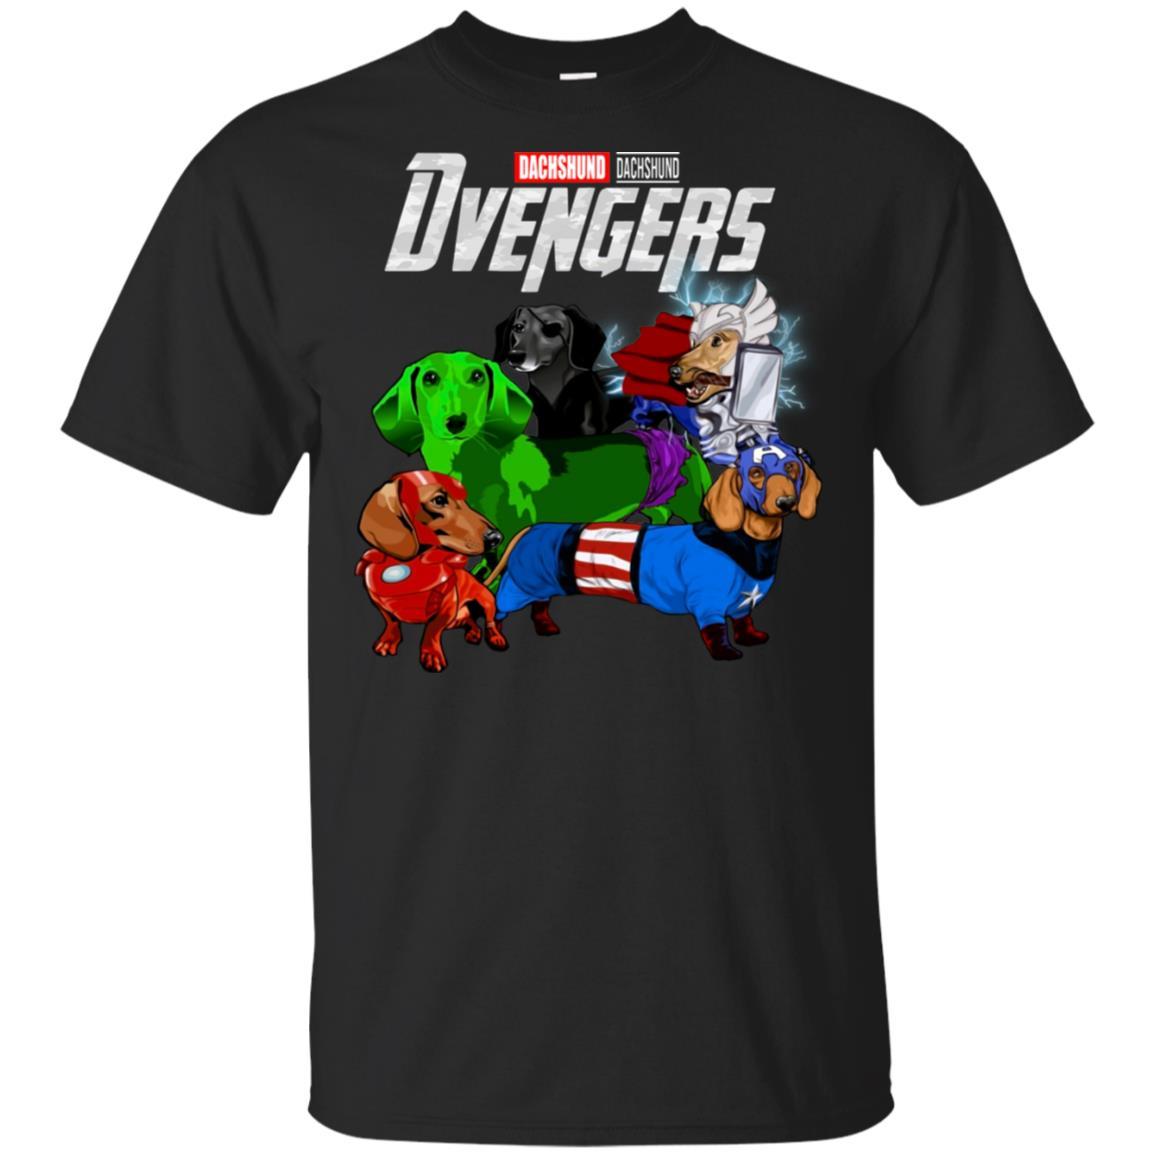 aeba3b02 Avengers Dvengers dachshund t shirt, tank, hoodie - RobinPlaceFabrics